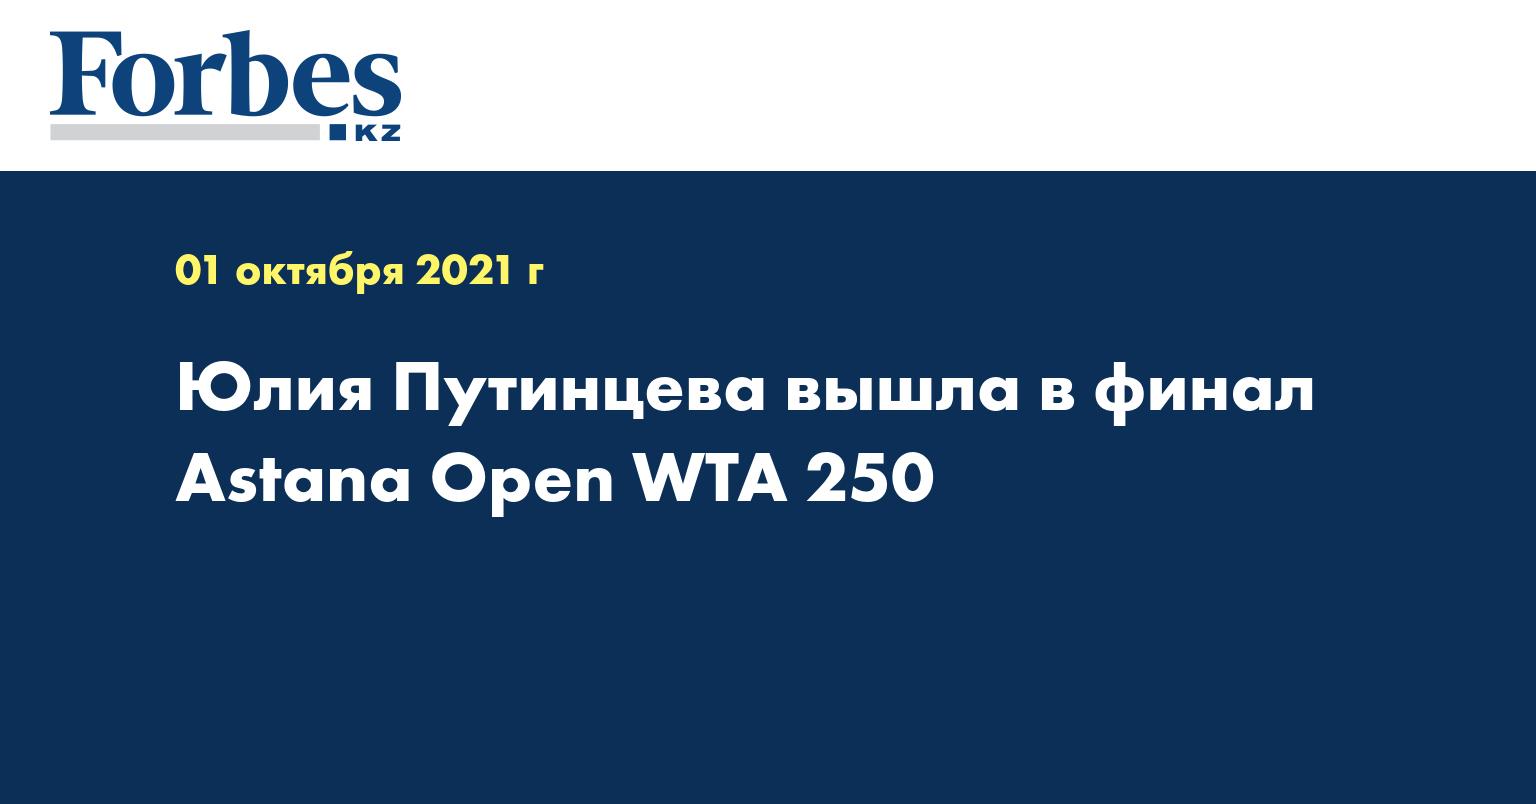 Юлия Путинцева вышла в финал Astana Open WTA 250